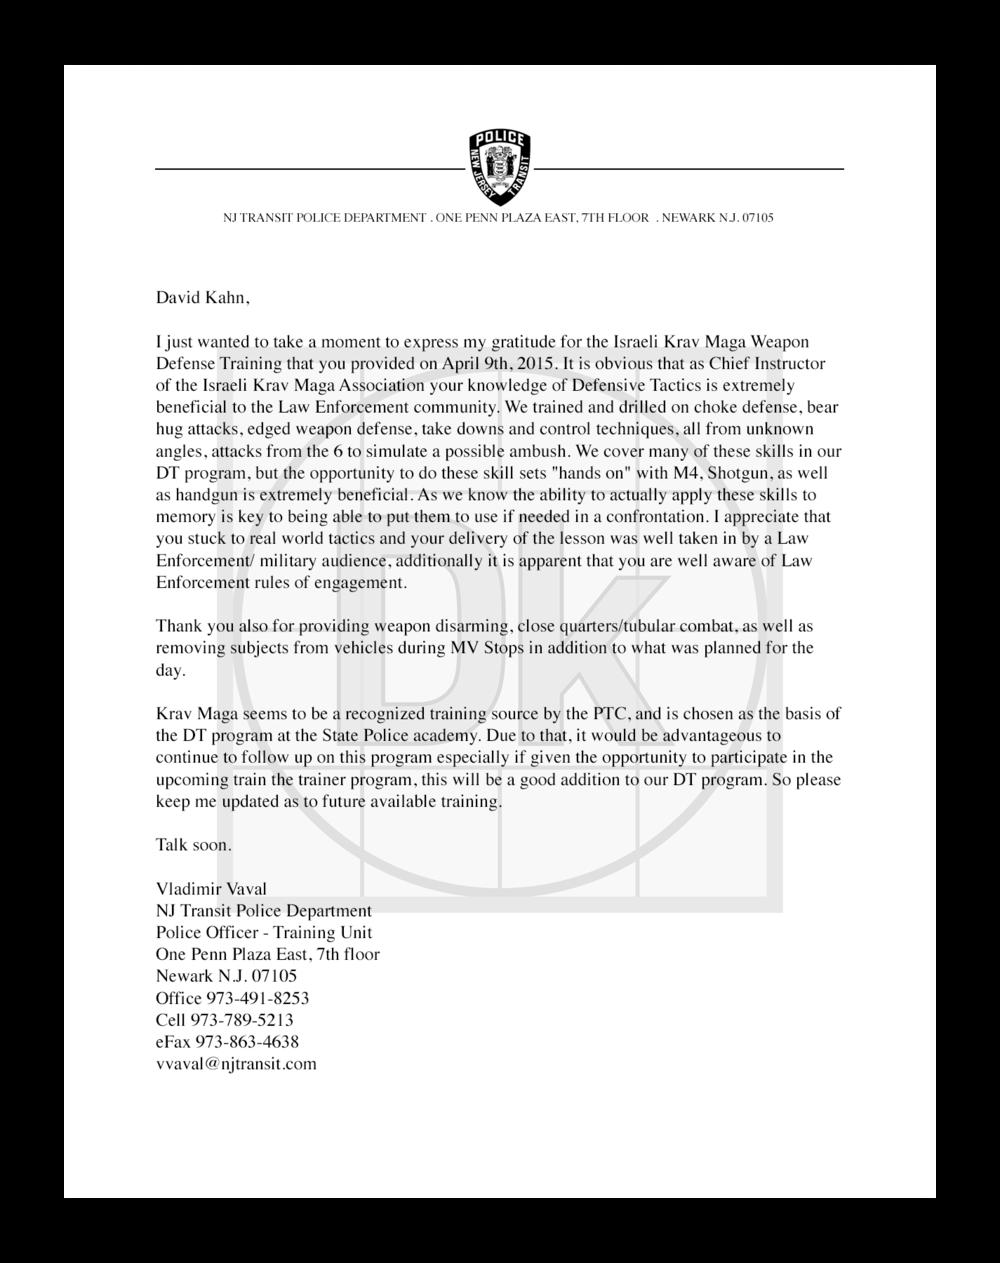 NJ Transit Police Department